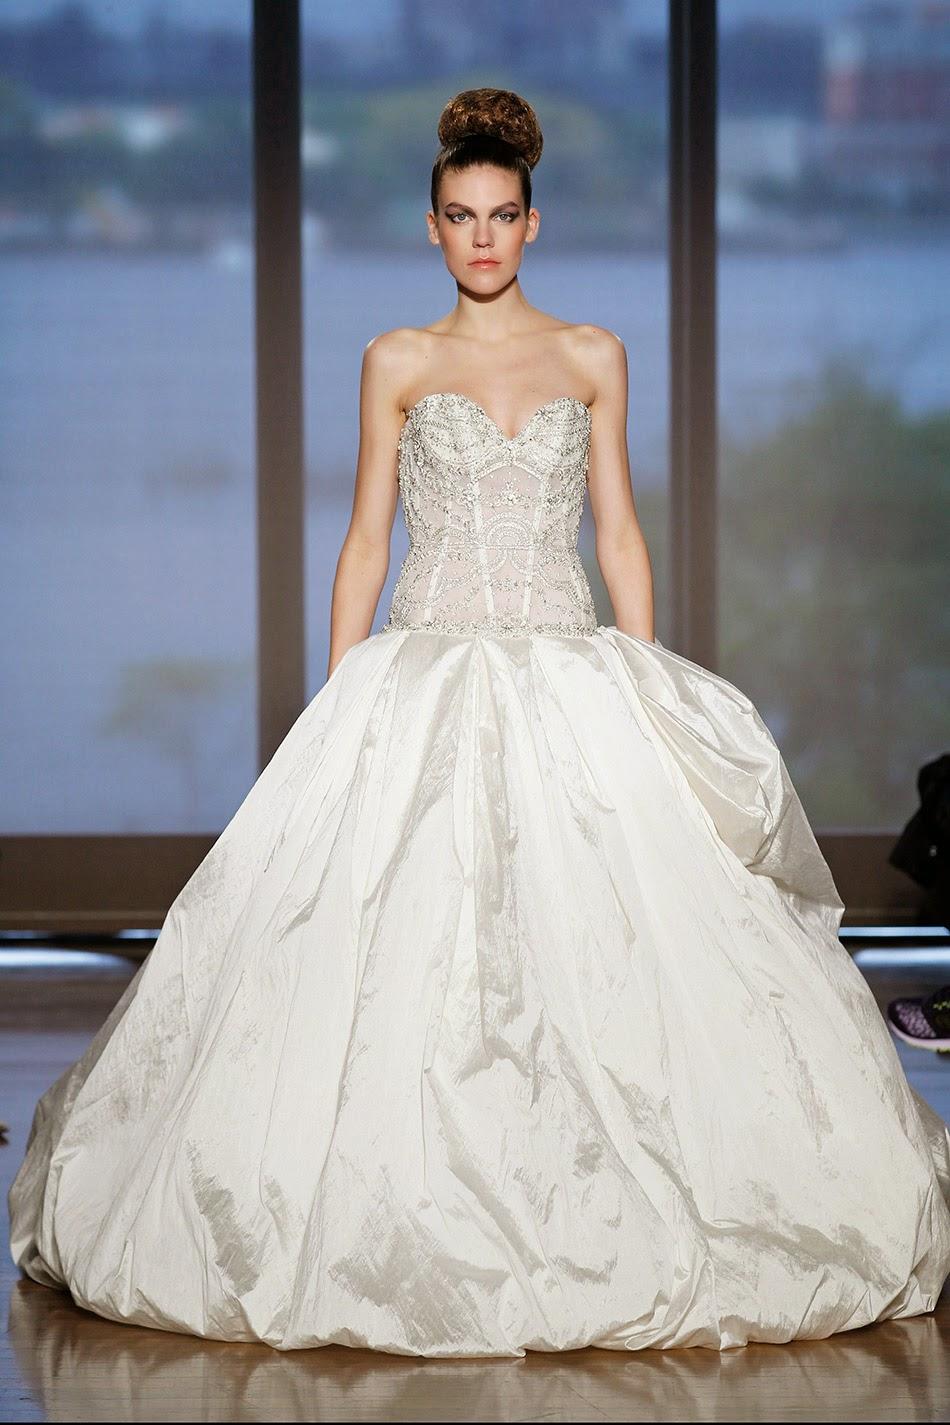 Bridesmaid Dresses Winter 2014